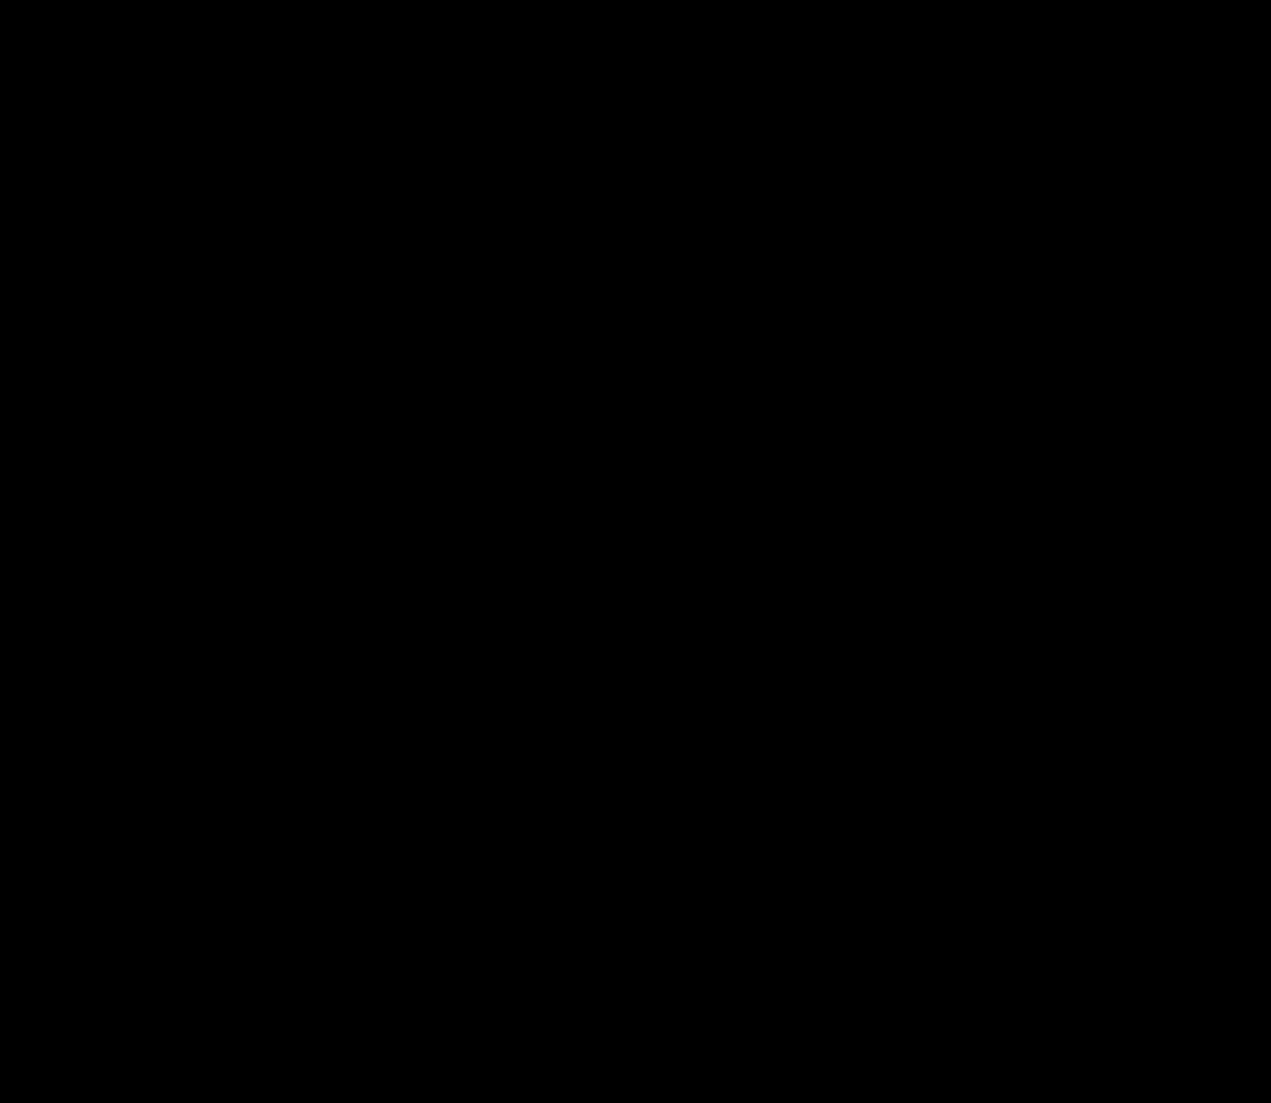 DOCNYC19_Laurels_OfficialSelection_RGBBlack